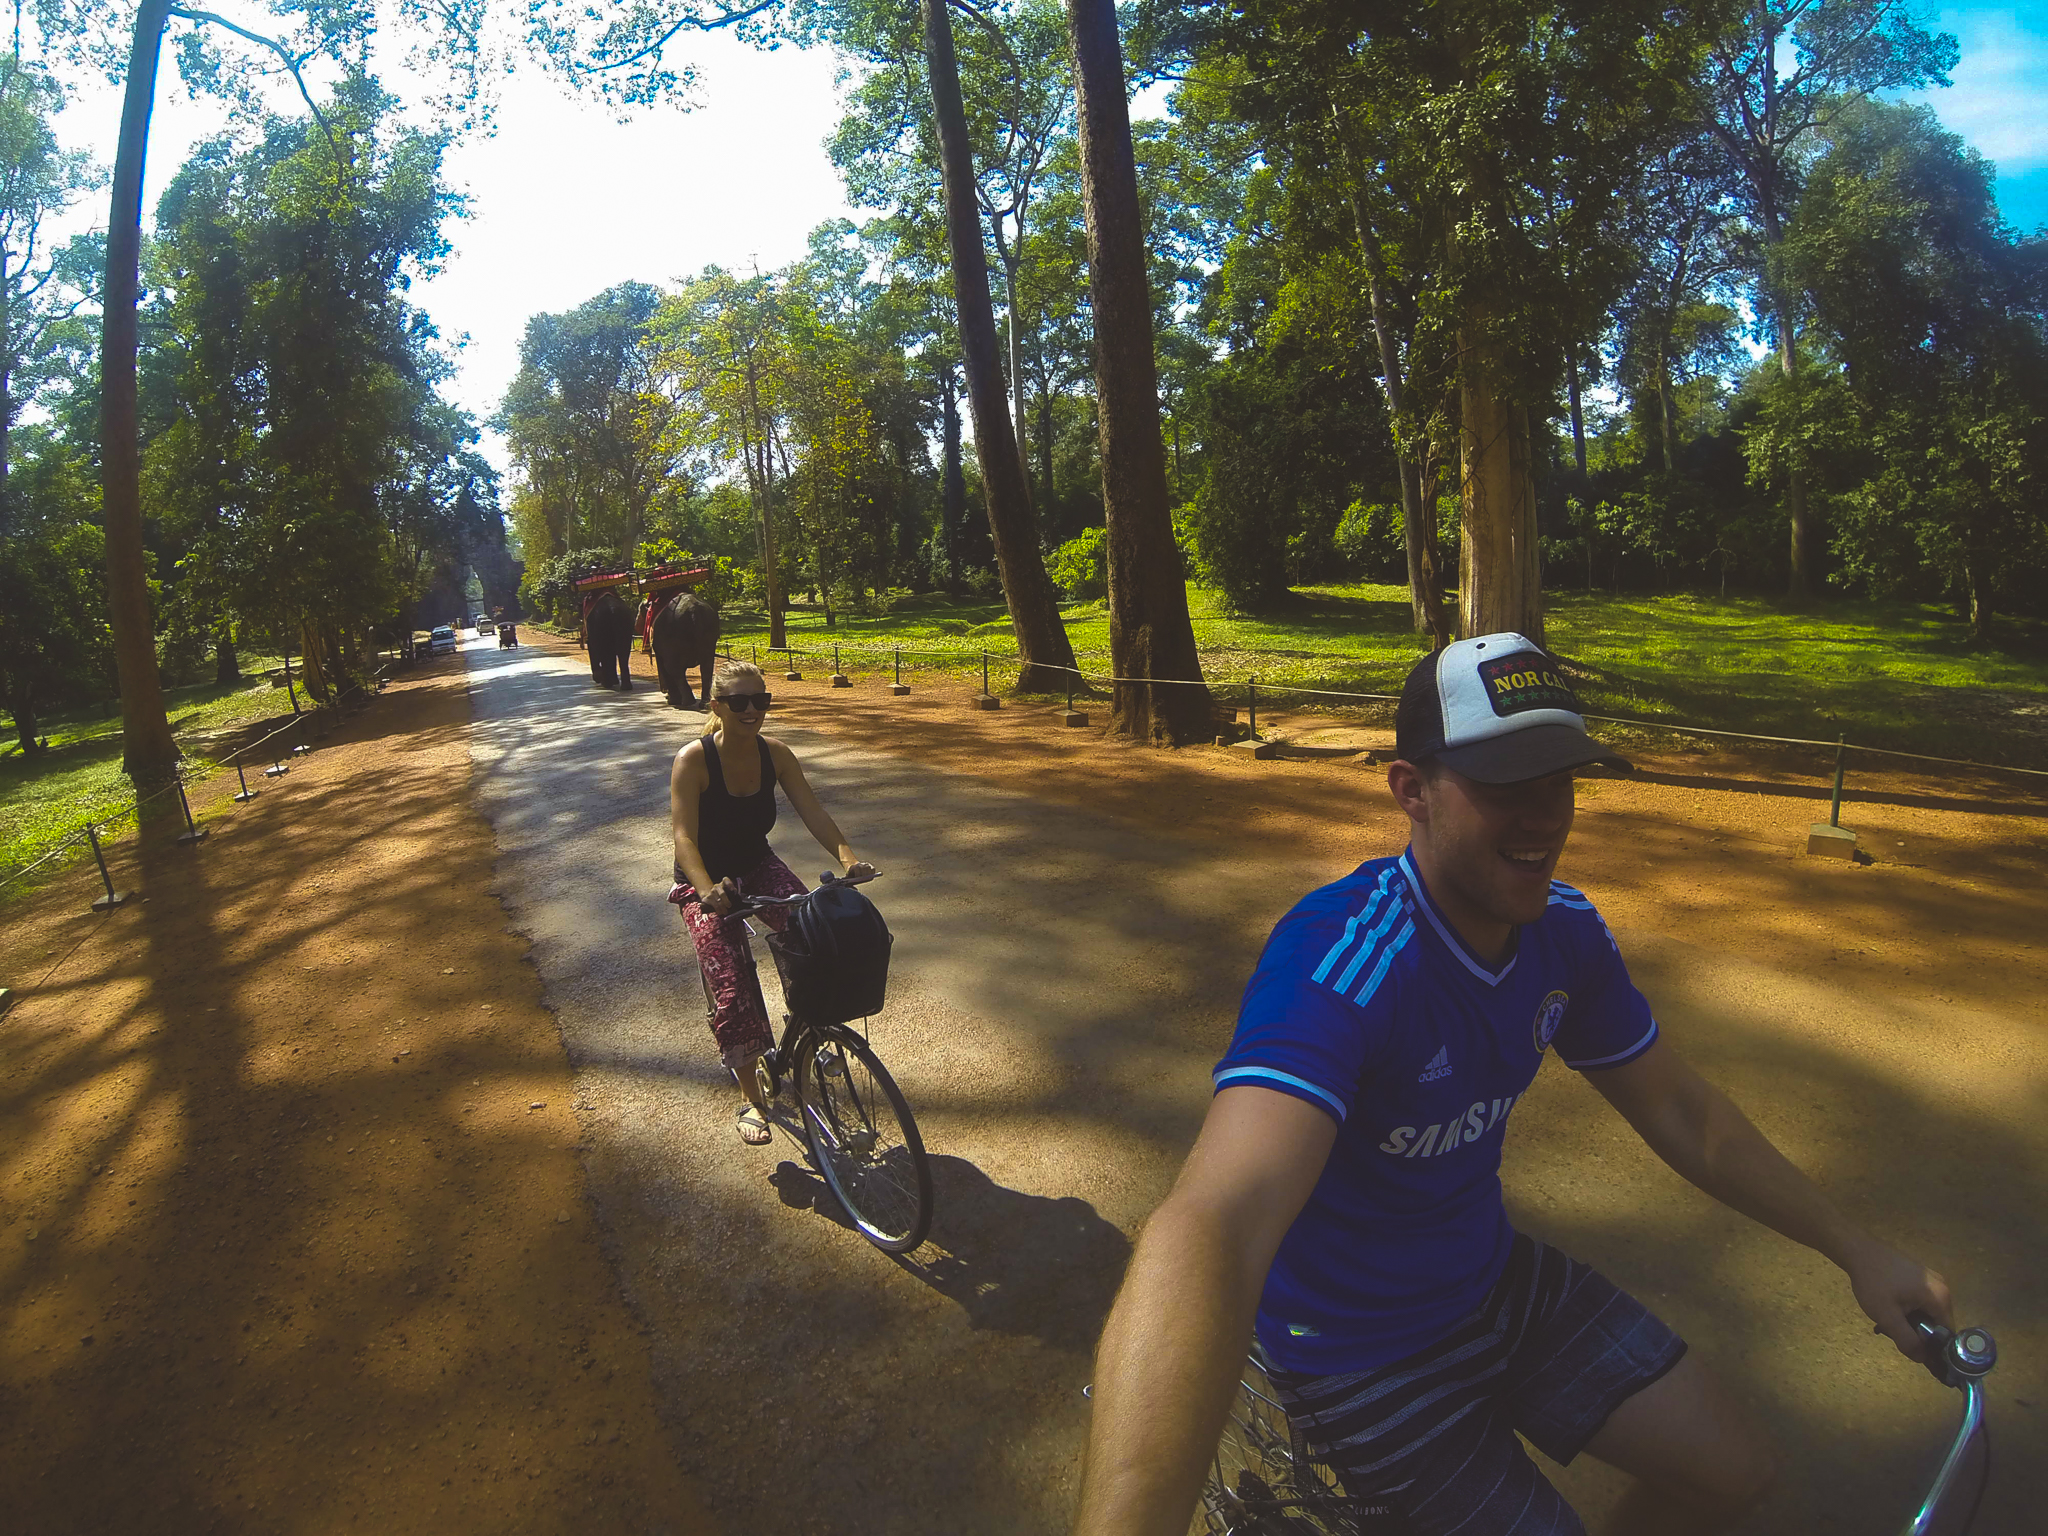 cambodia blog (32 of 34).jpg